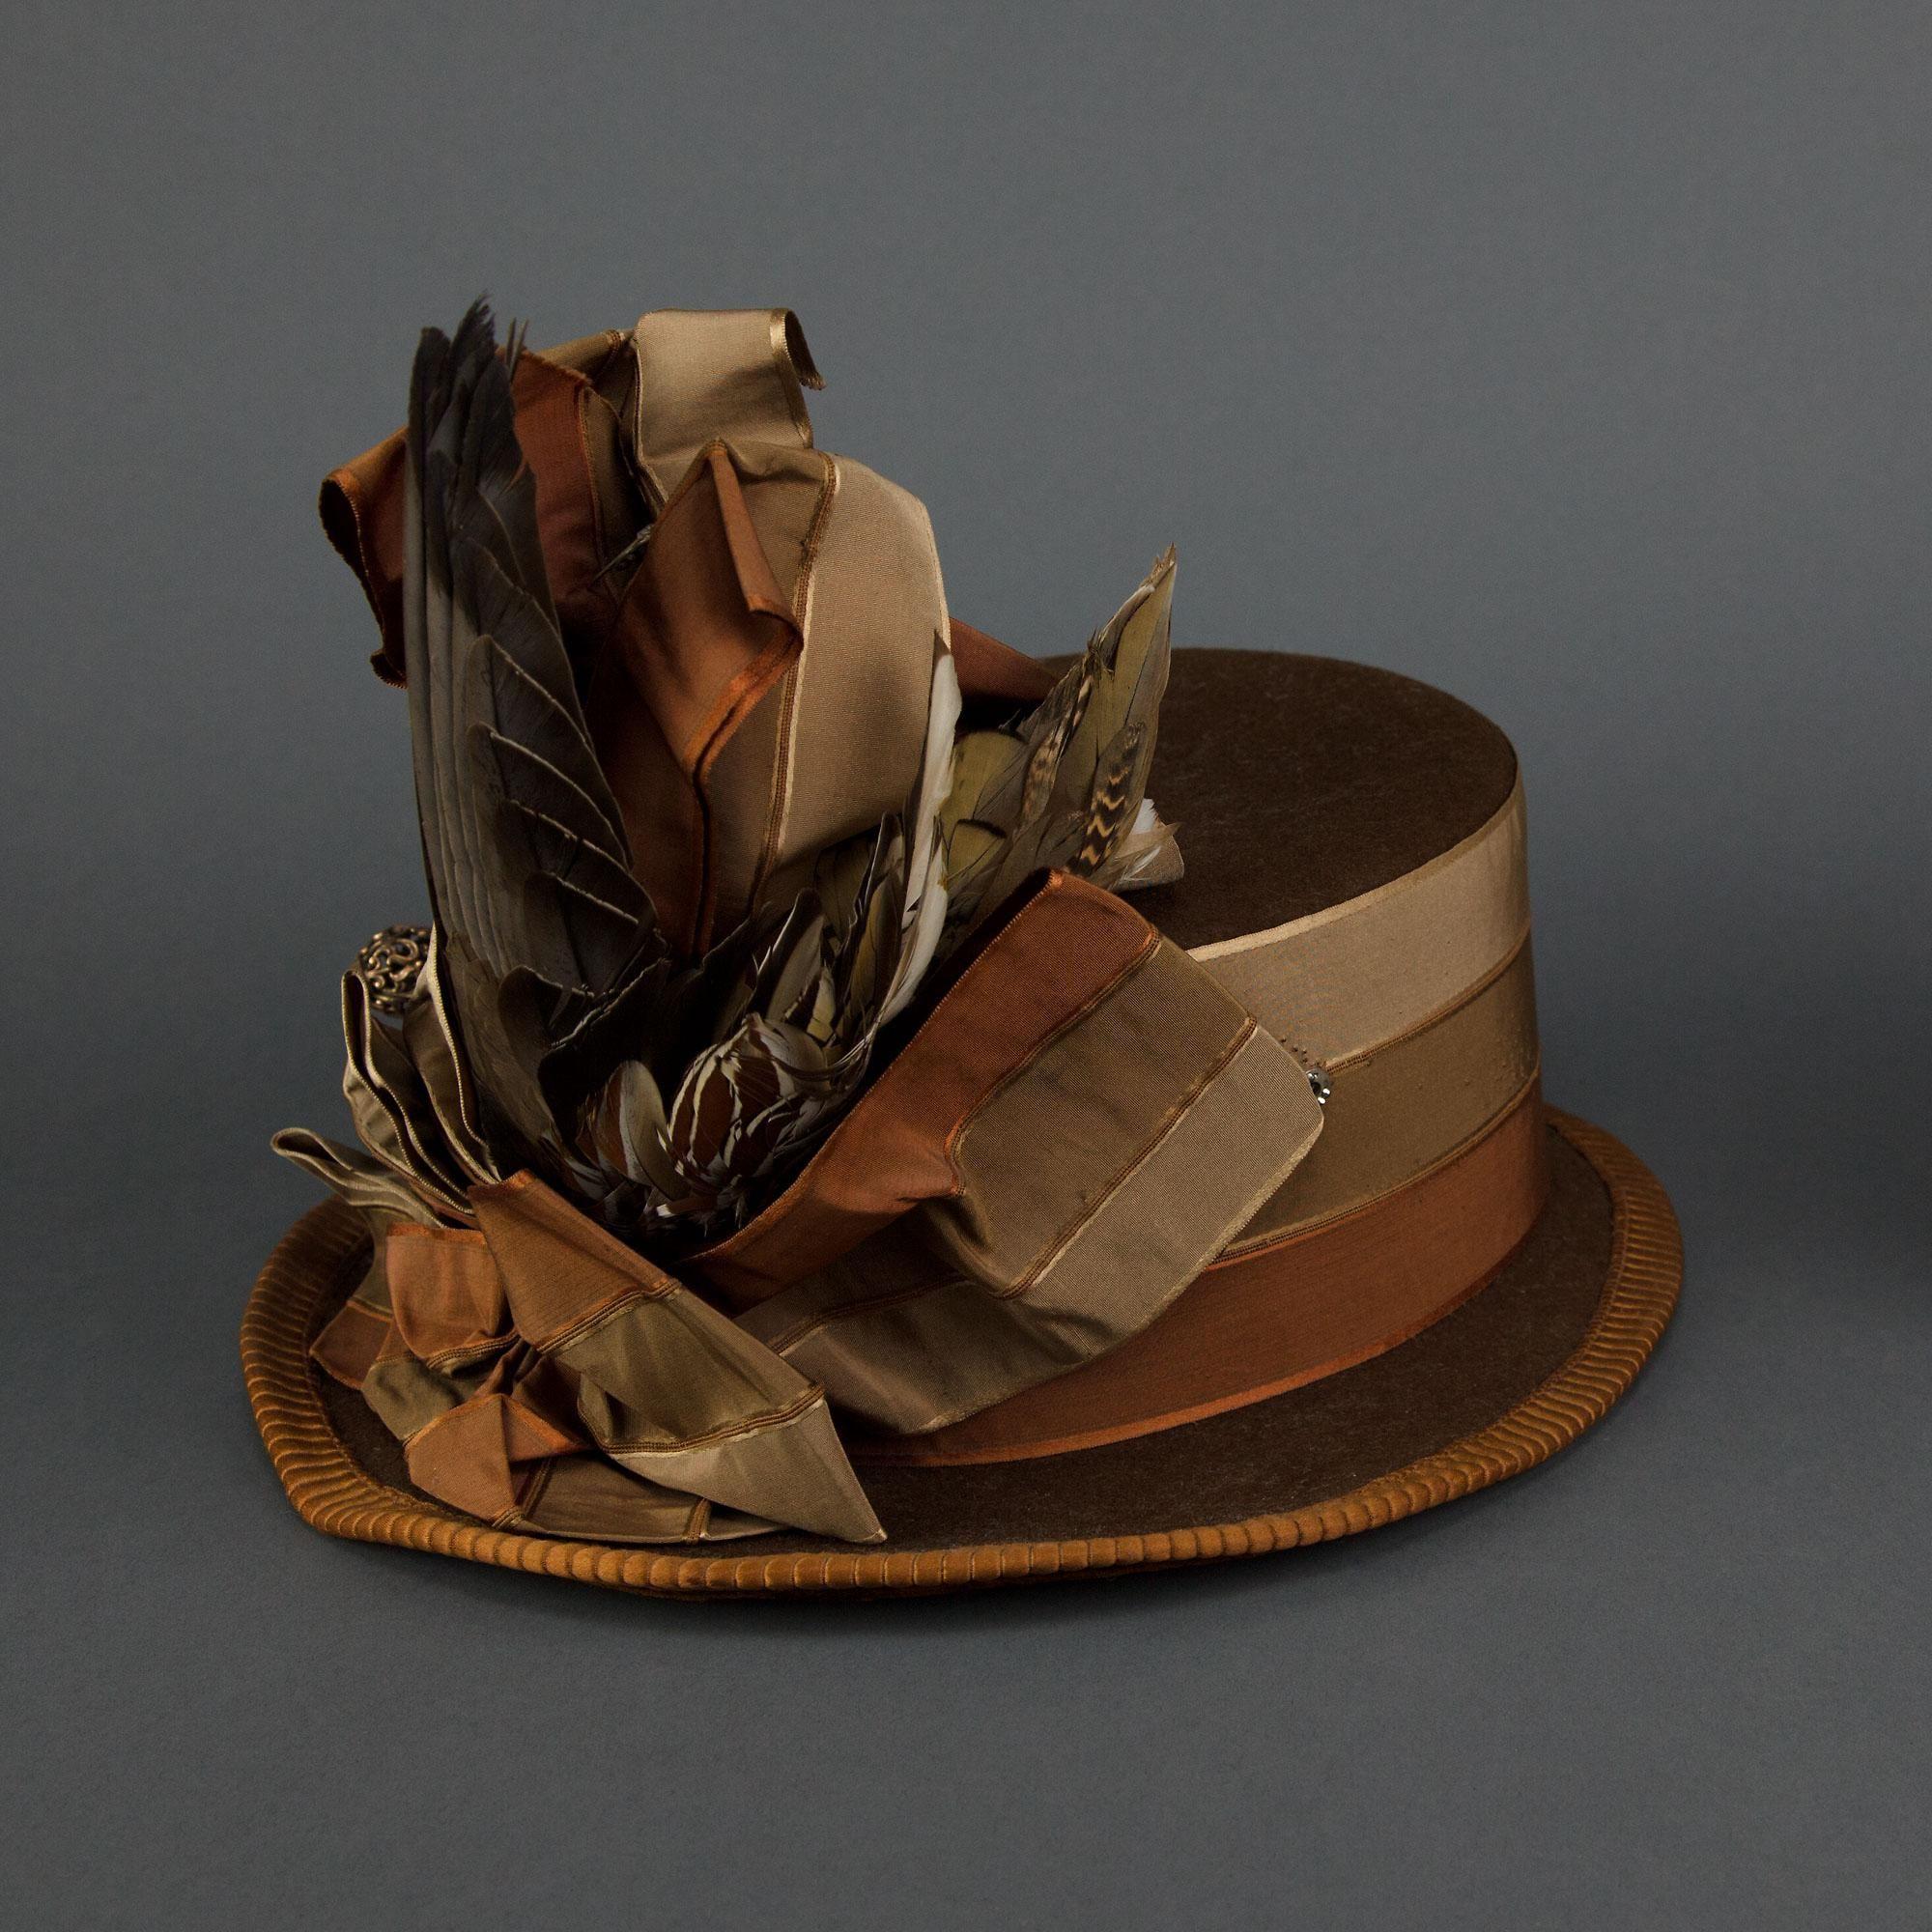 Going-away hat (image 3) | 1888 | Oakland Museum of California | Item #: H4442.43U